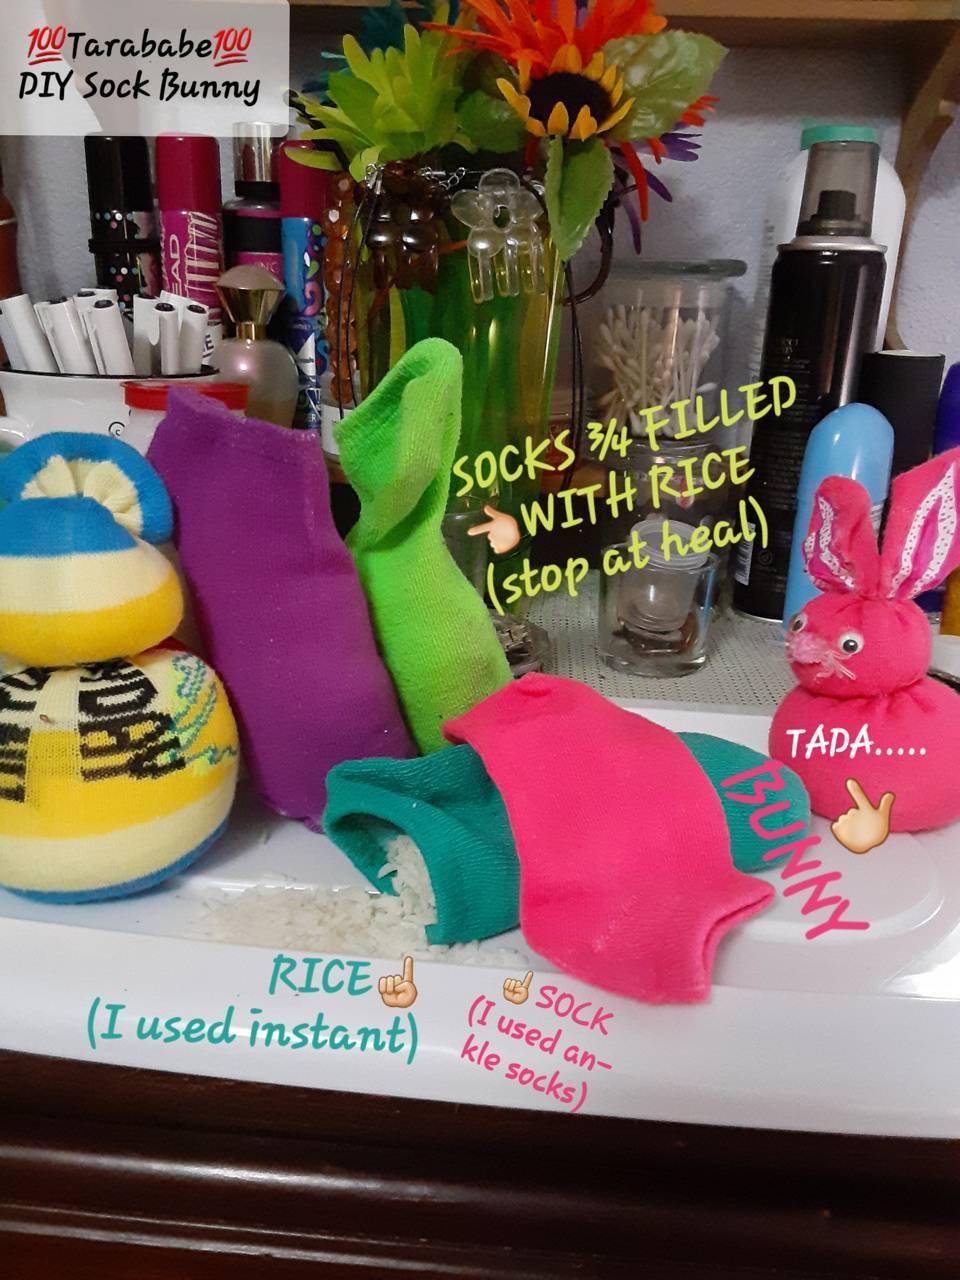 Tarababes Sock Bunny